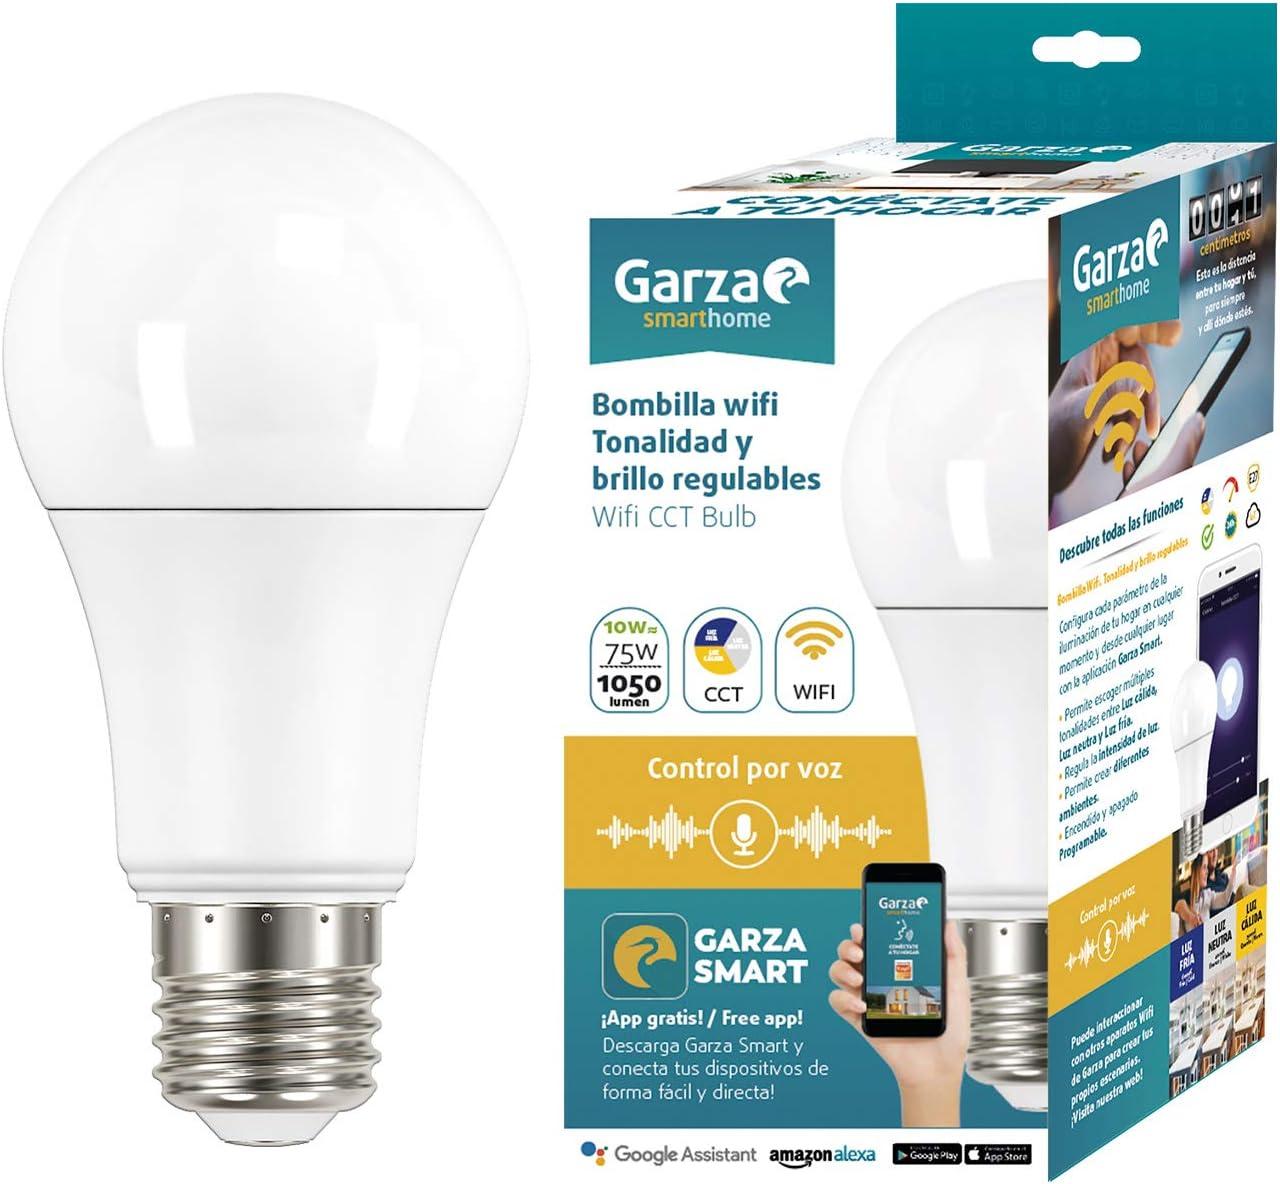 Garza Bombilla LED WiFi CCT Alexa, 10 W, Blanco, 70 x 135 mm: Amazon.es: Iluminación